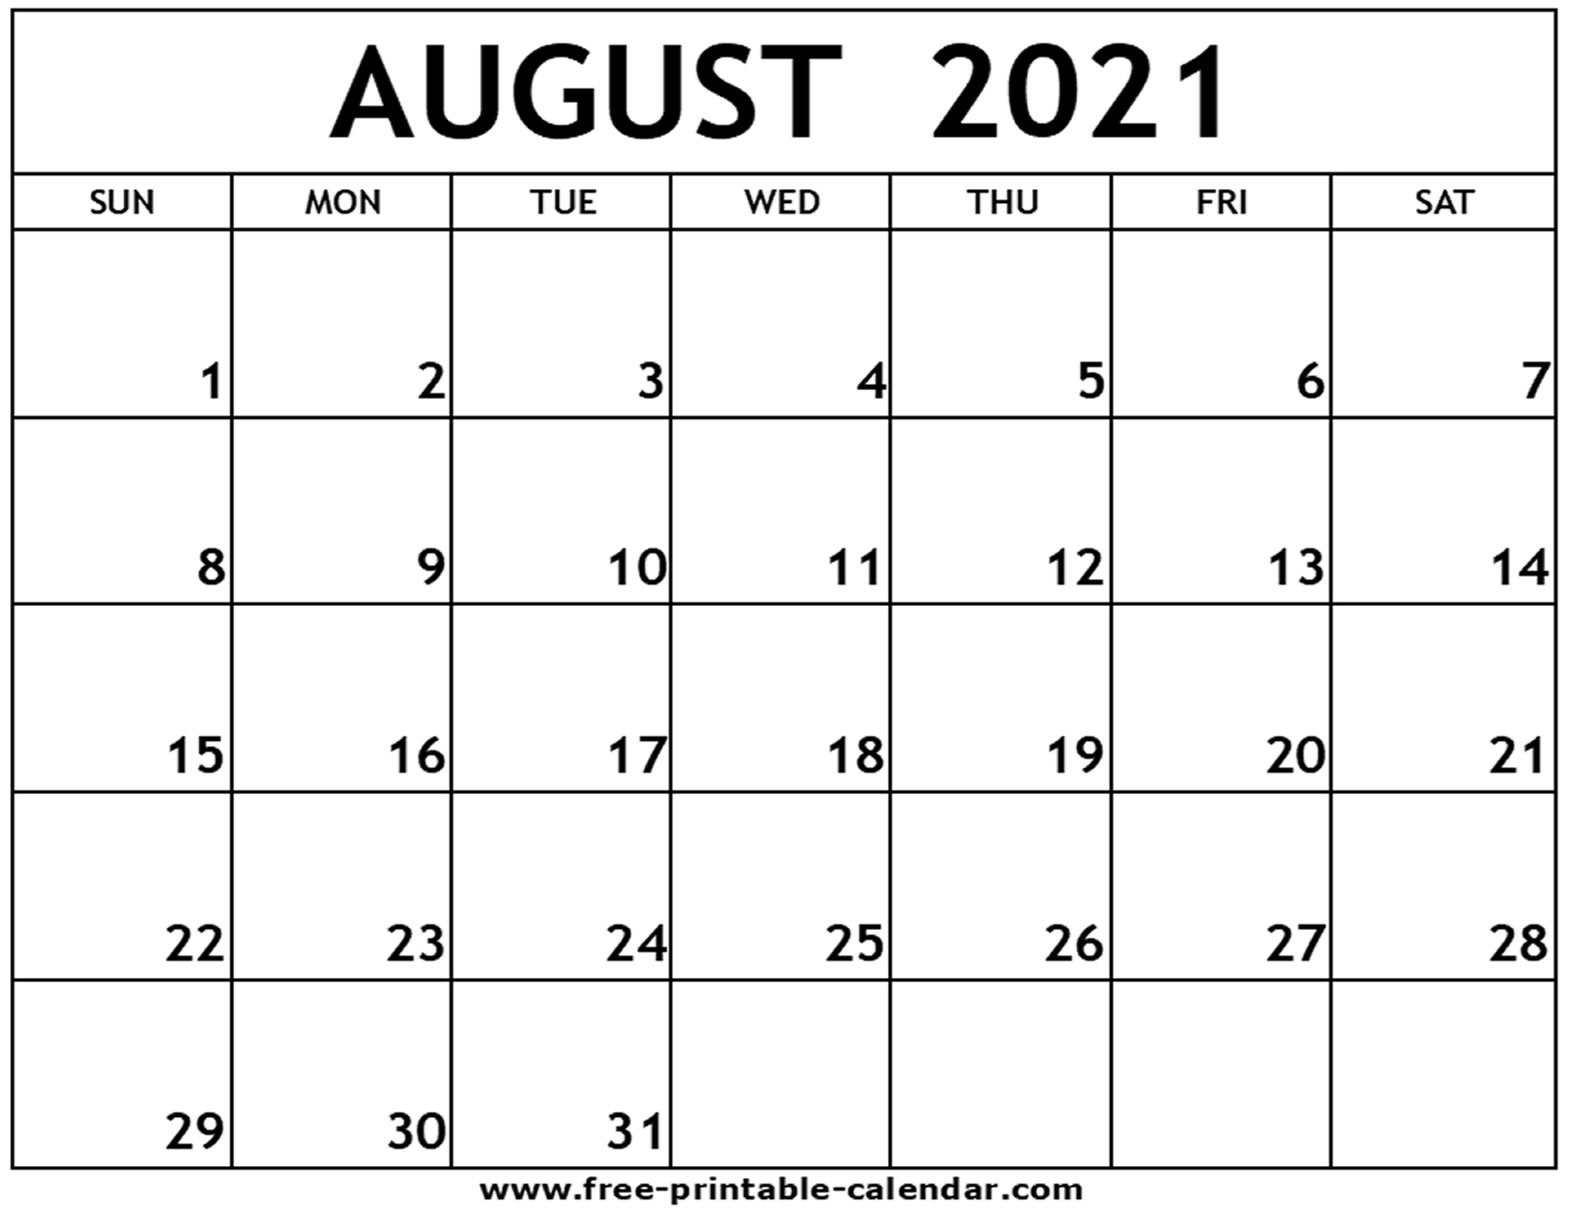 Take August 2021 Calendar Pdf